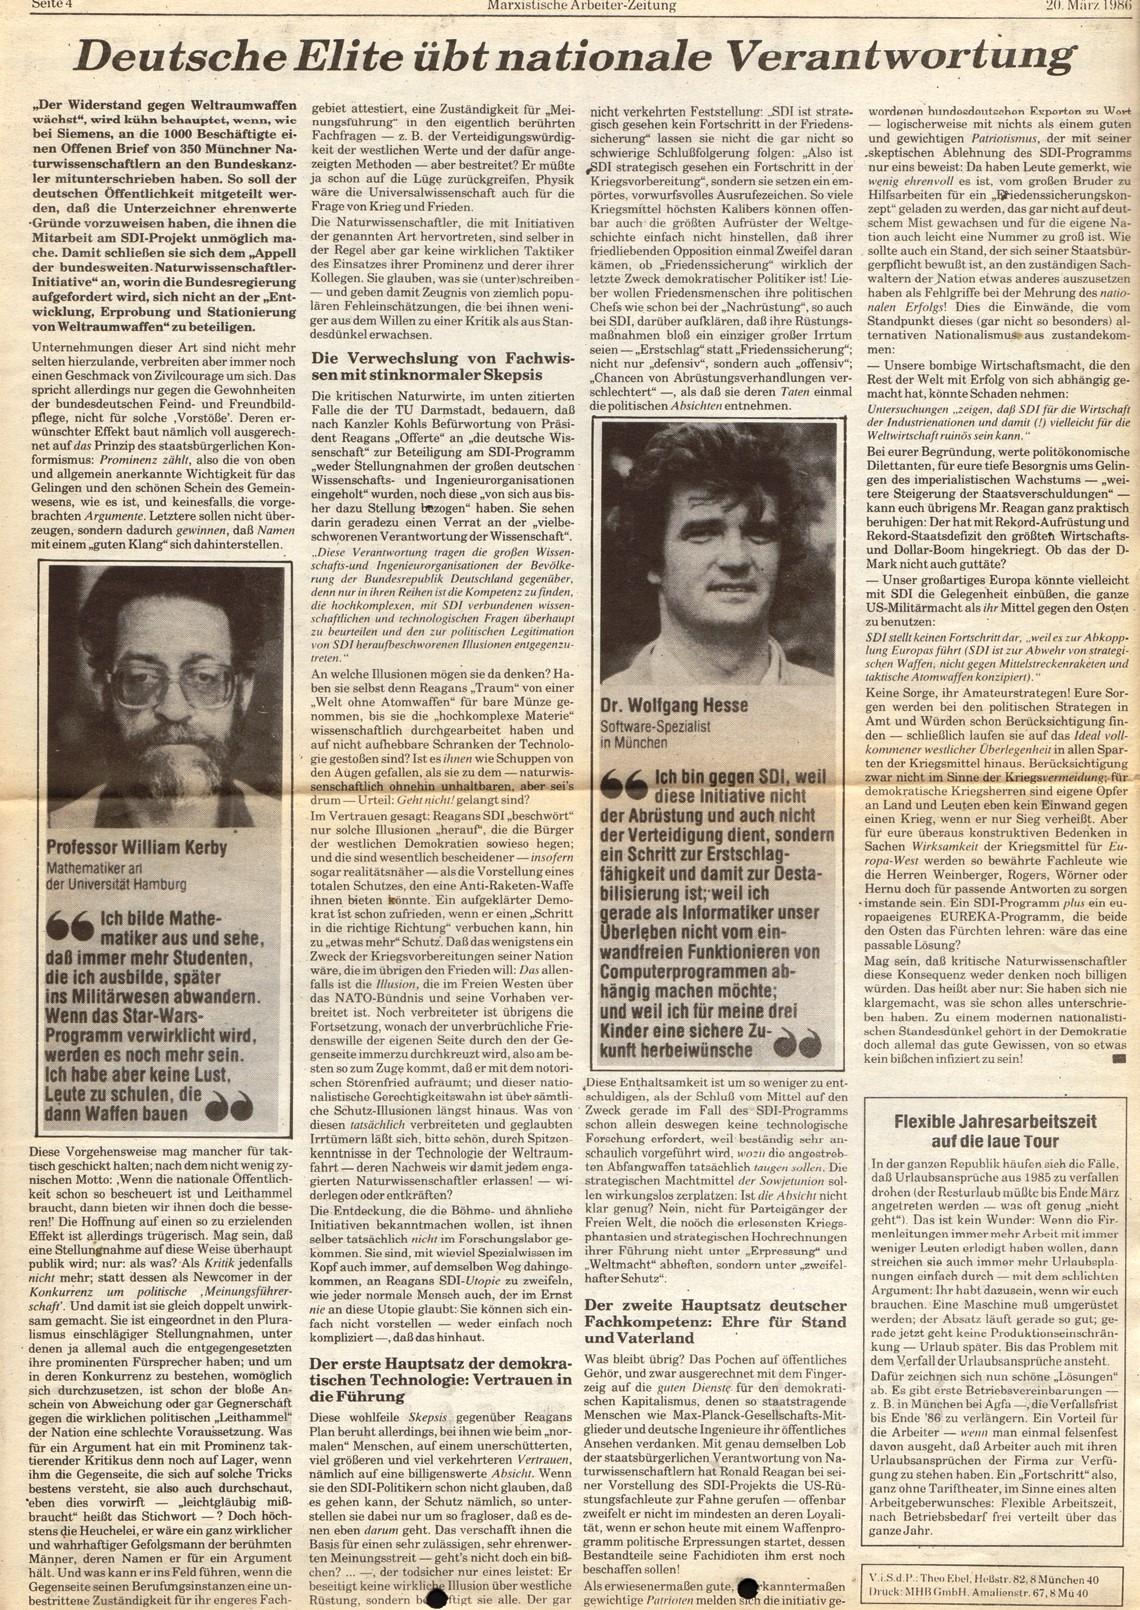 Muenchen_MG_MAZ_Siemens_19860320_04